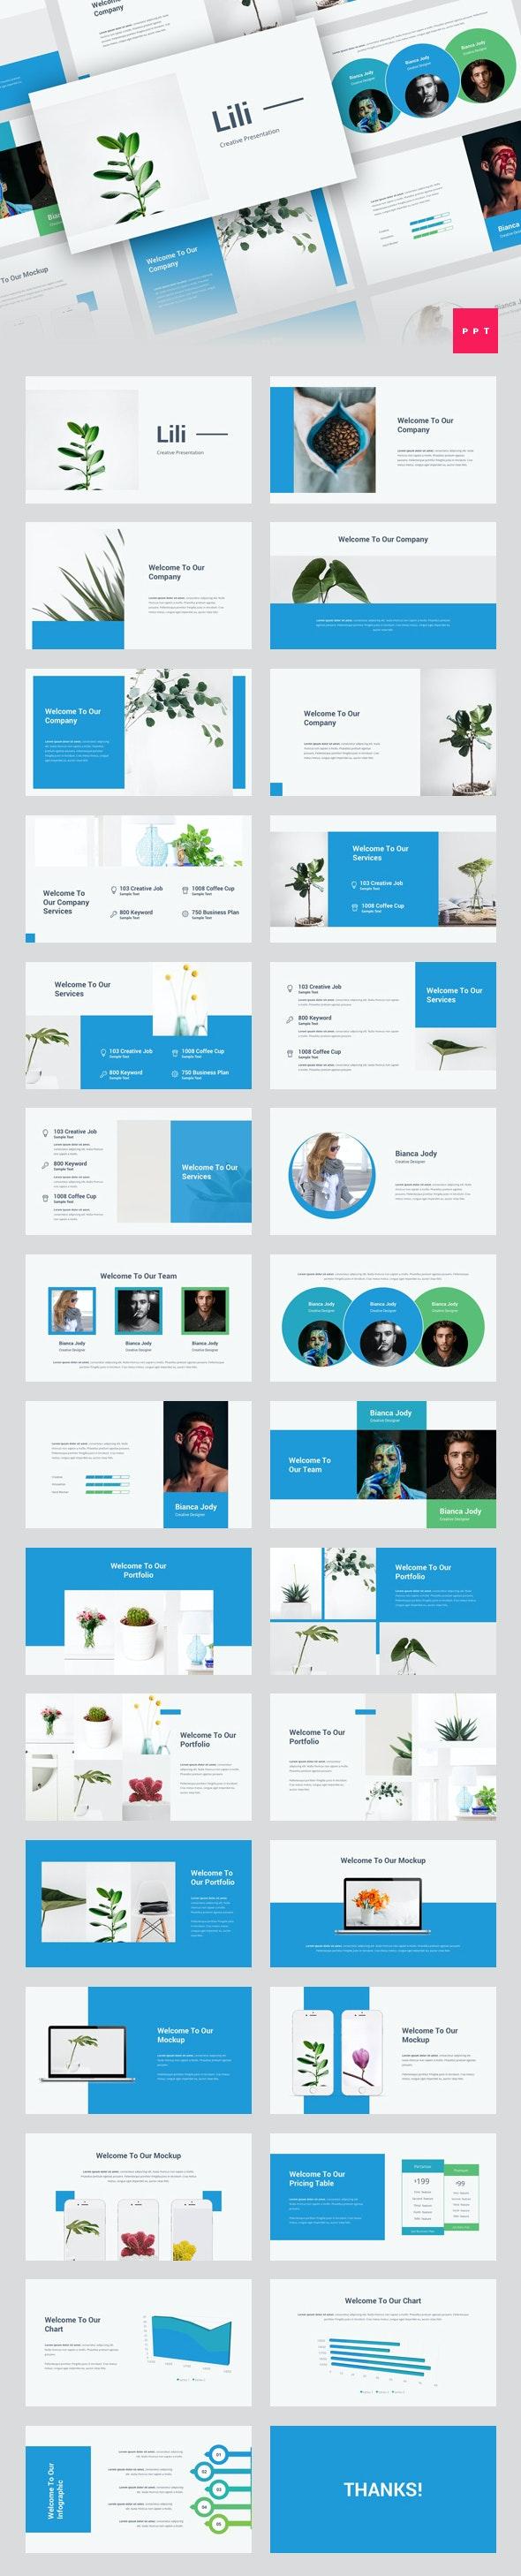 Lili - Creative PowerPoint Template - Creative PowerPoint Templates